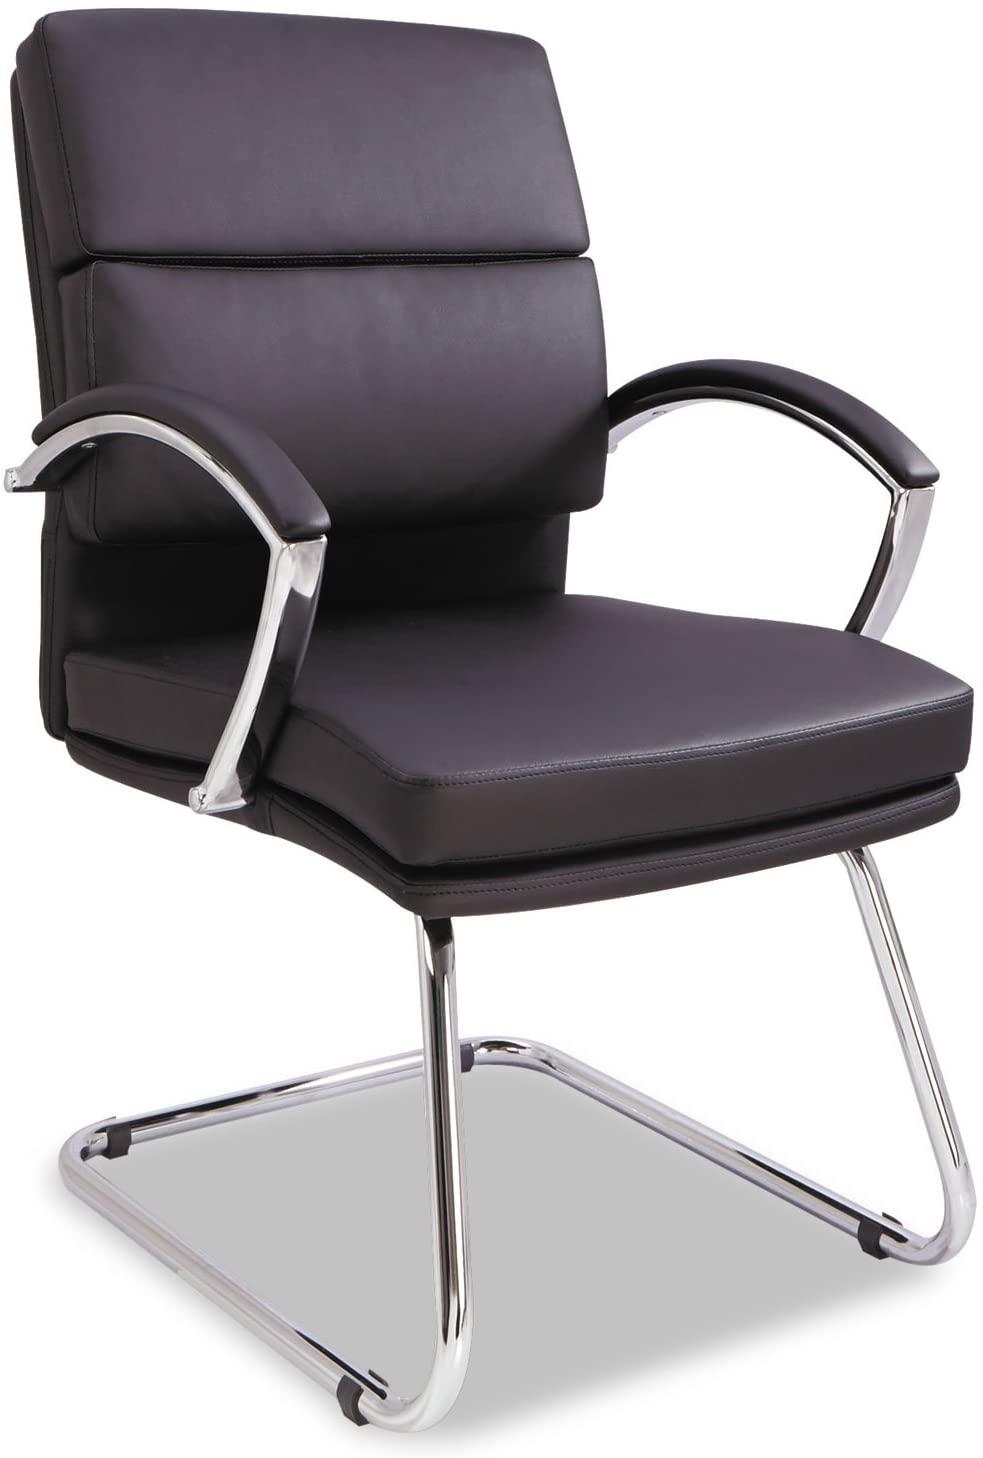 Alera NR4319 Neratoli Series Slim Profile Guest Chair, Black Soft Leather, Chrome Frame